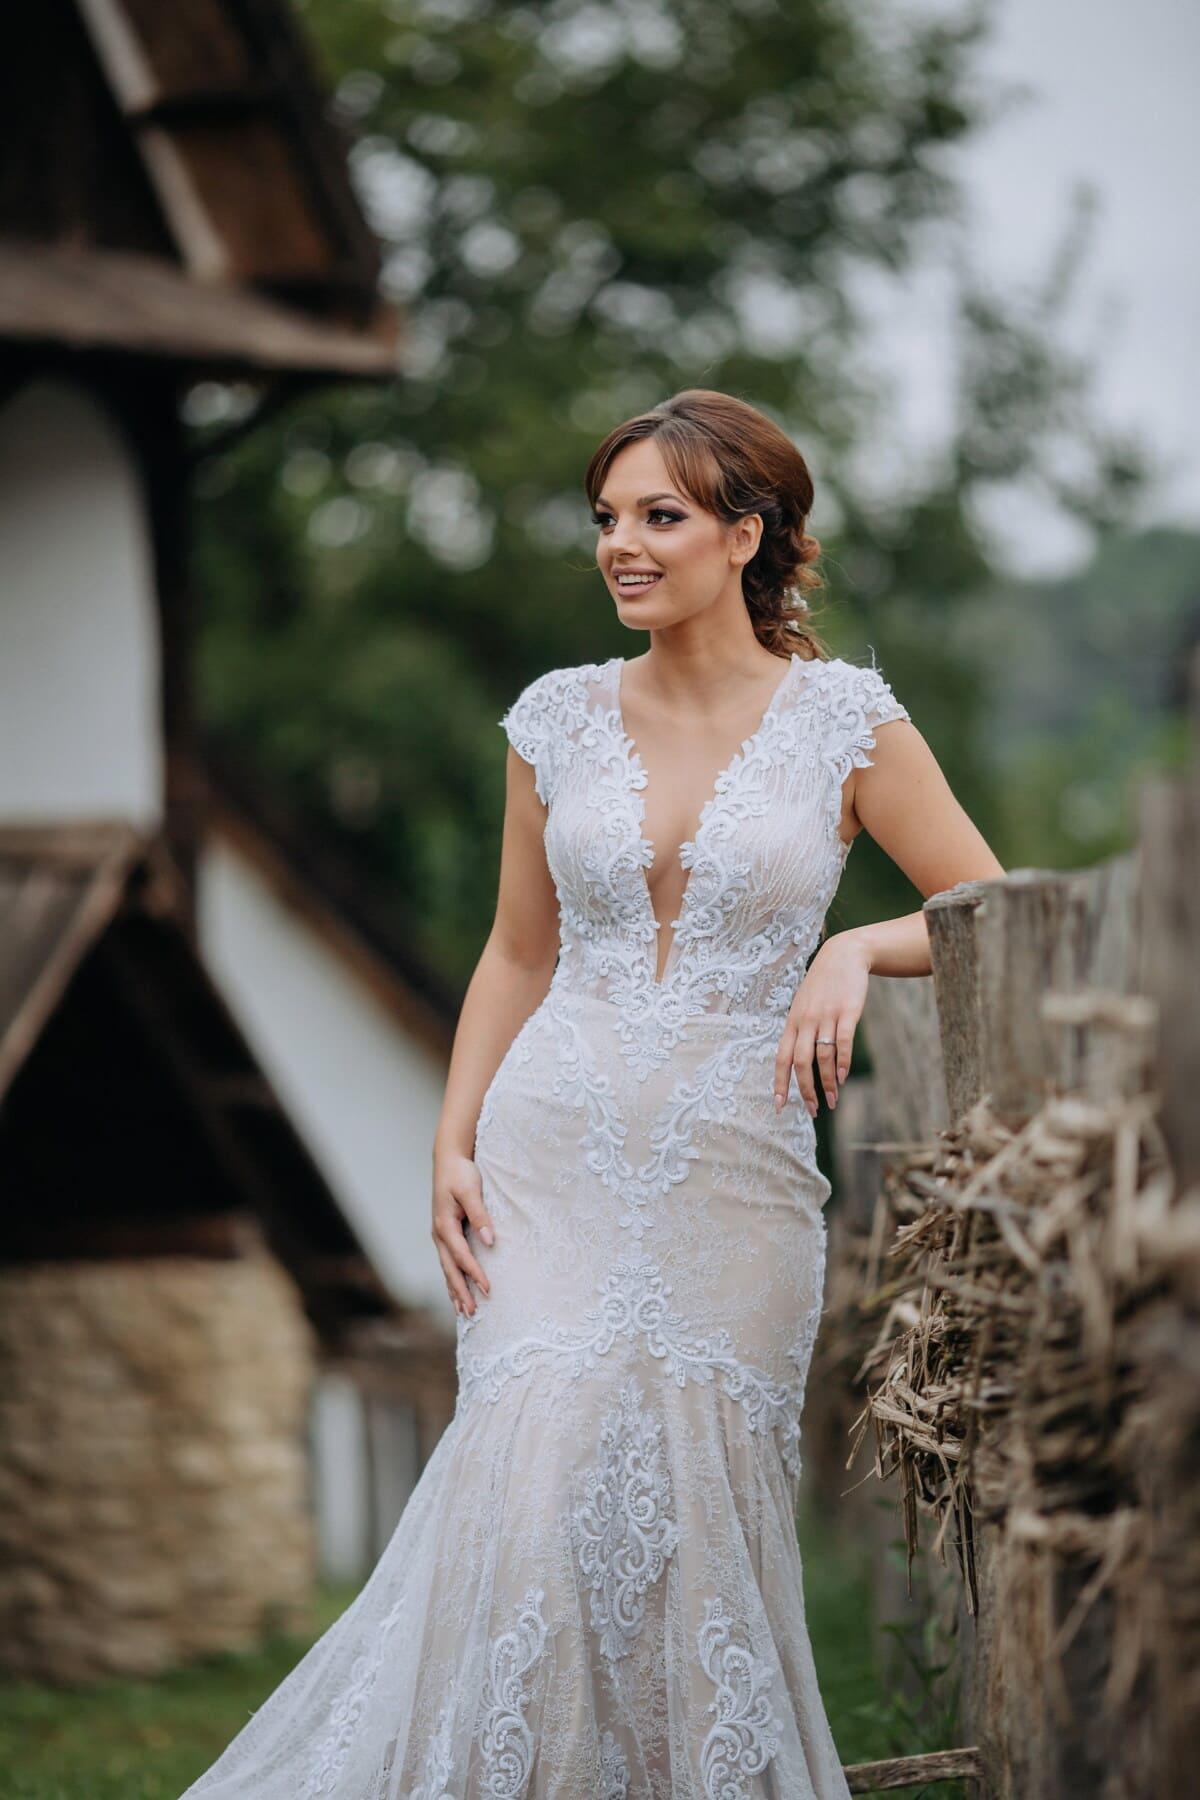 gorgeous, countryside, brunette, village, farmhouse, cottage, picket fence, girl, model, fashion